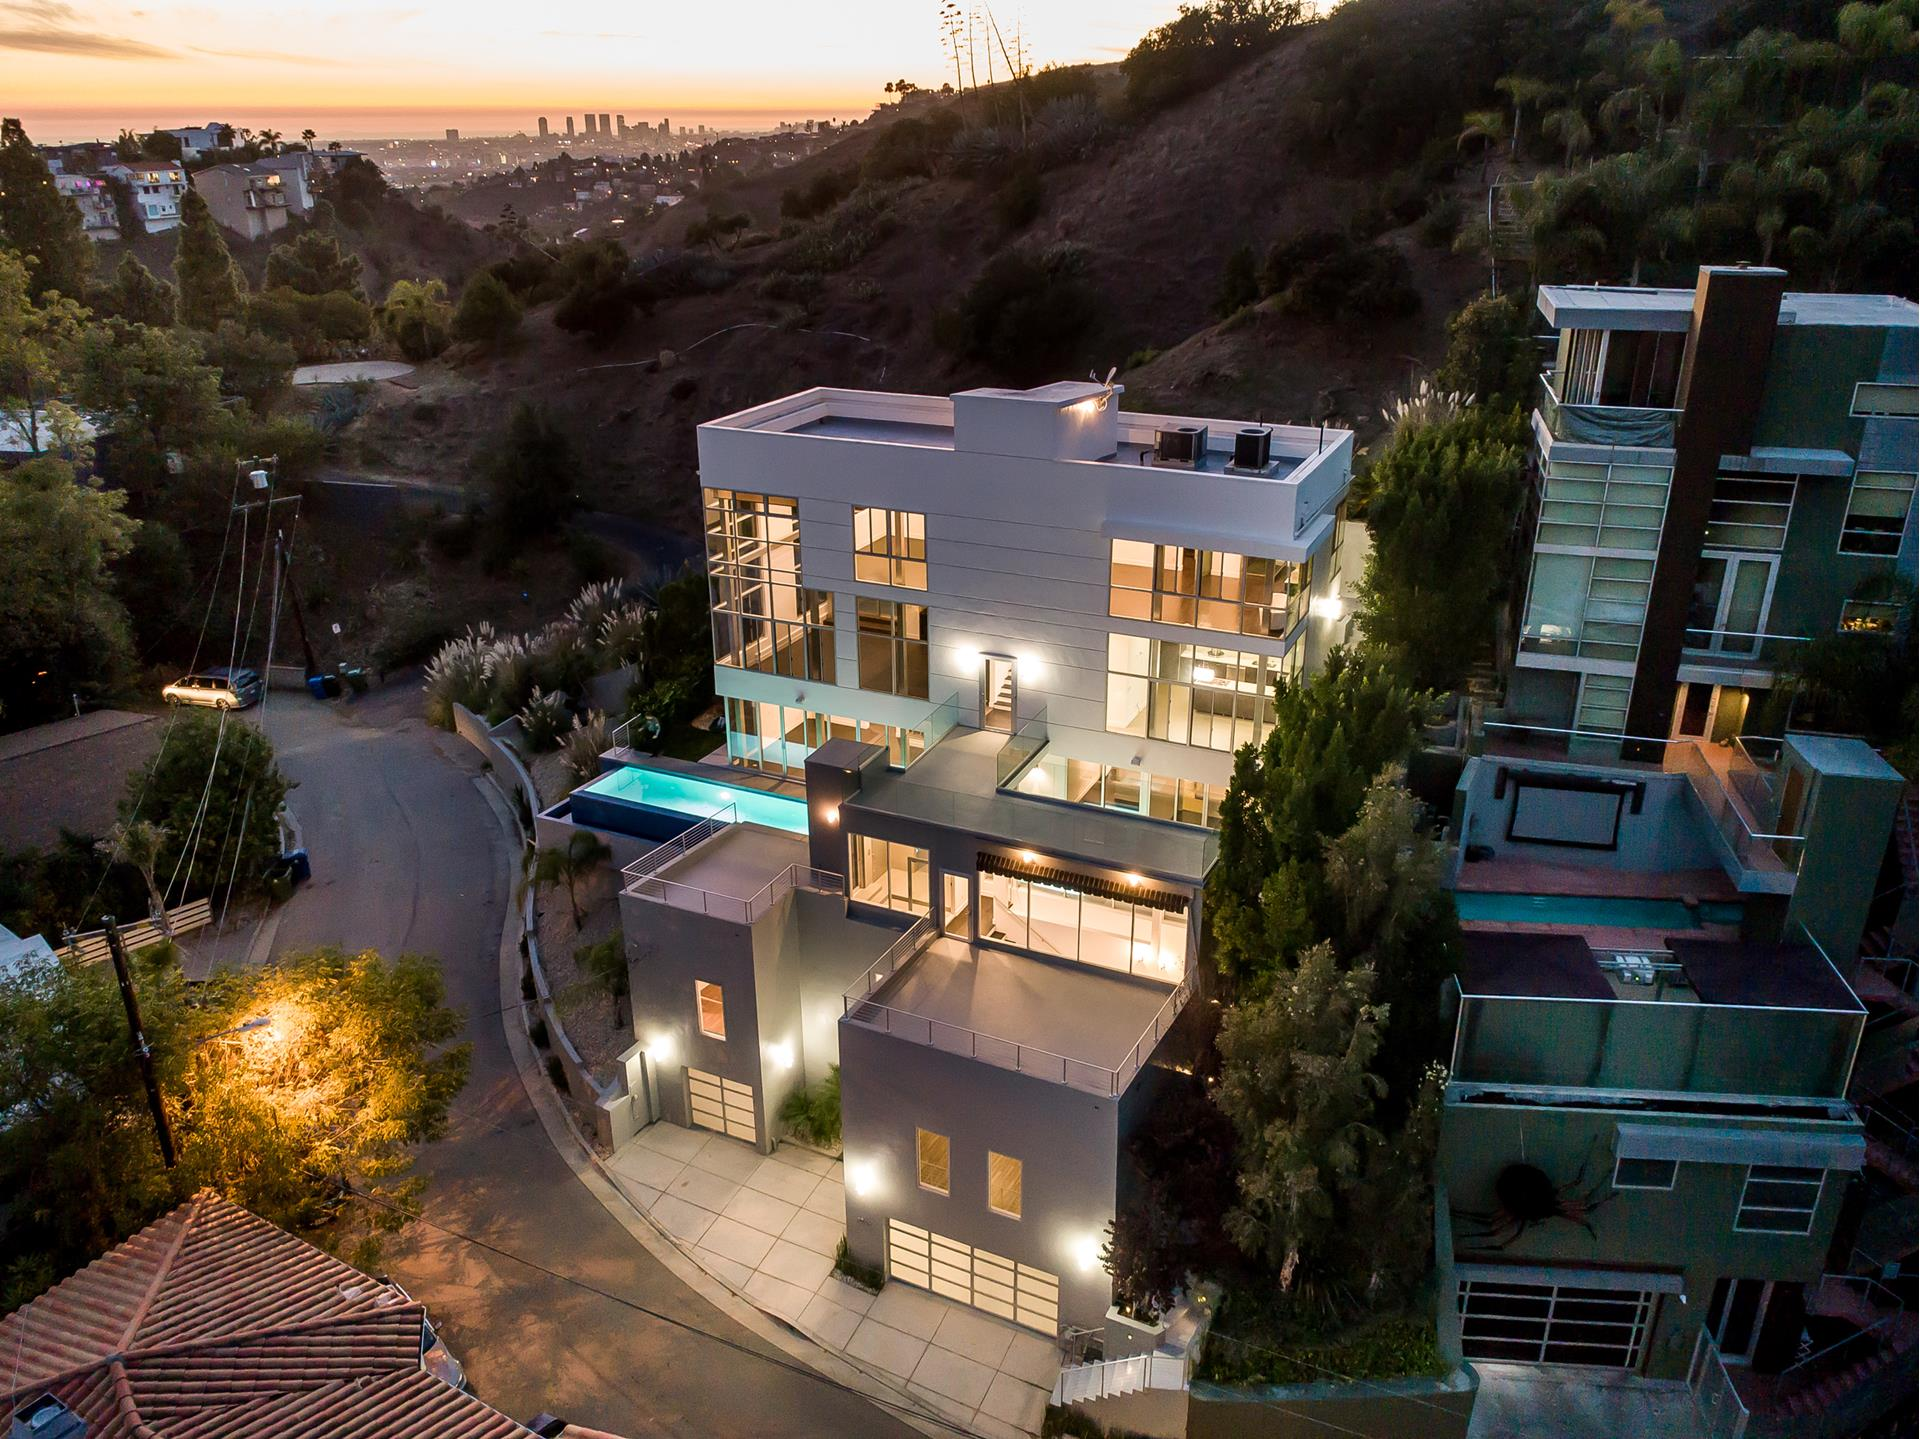 2746 RINCONIA Drive - Hollywood Hills East, California